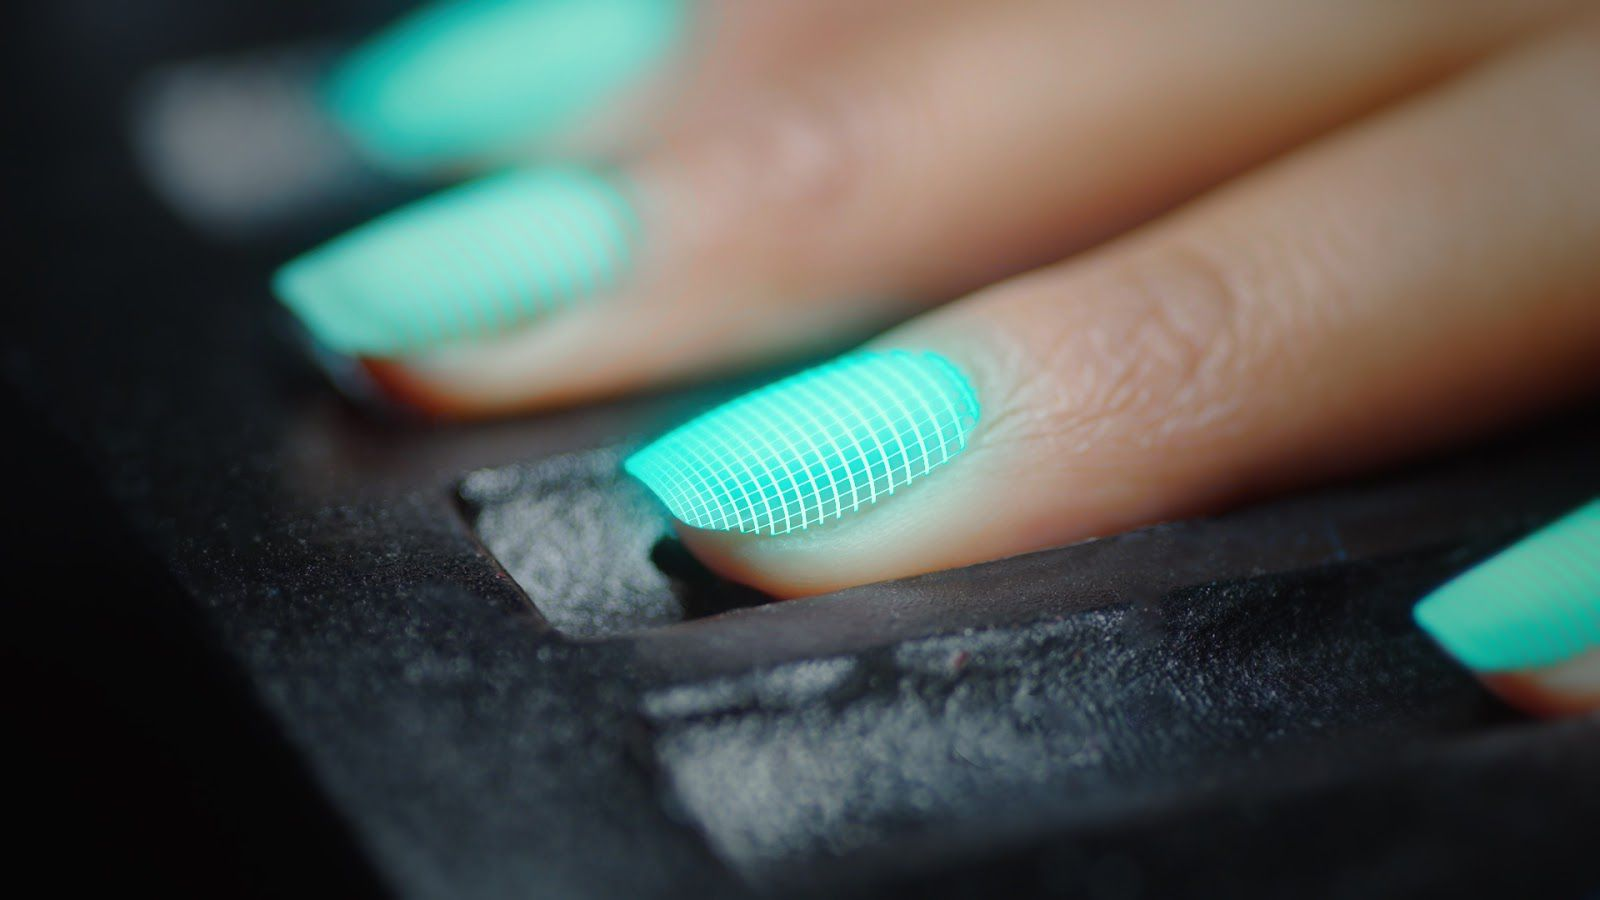 Interior close up shot of a person's hand inside Nimble AI nail machine